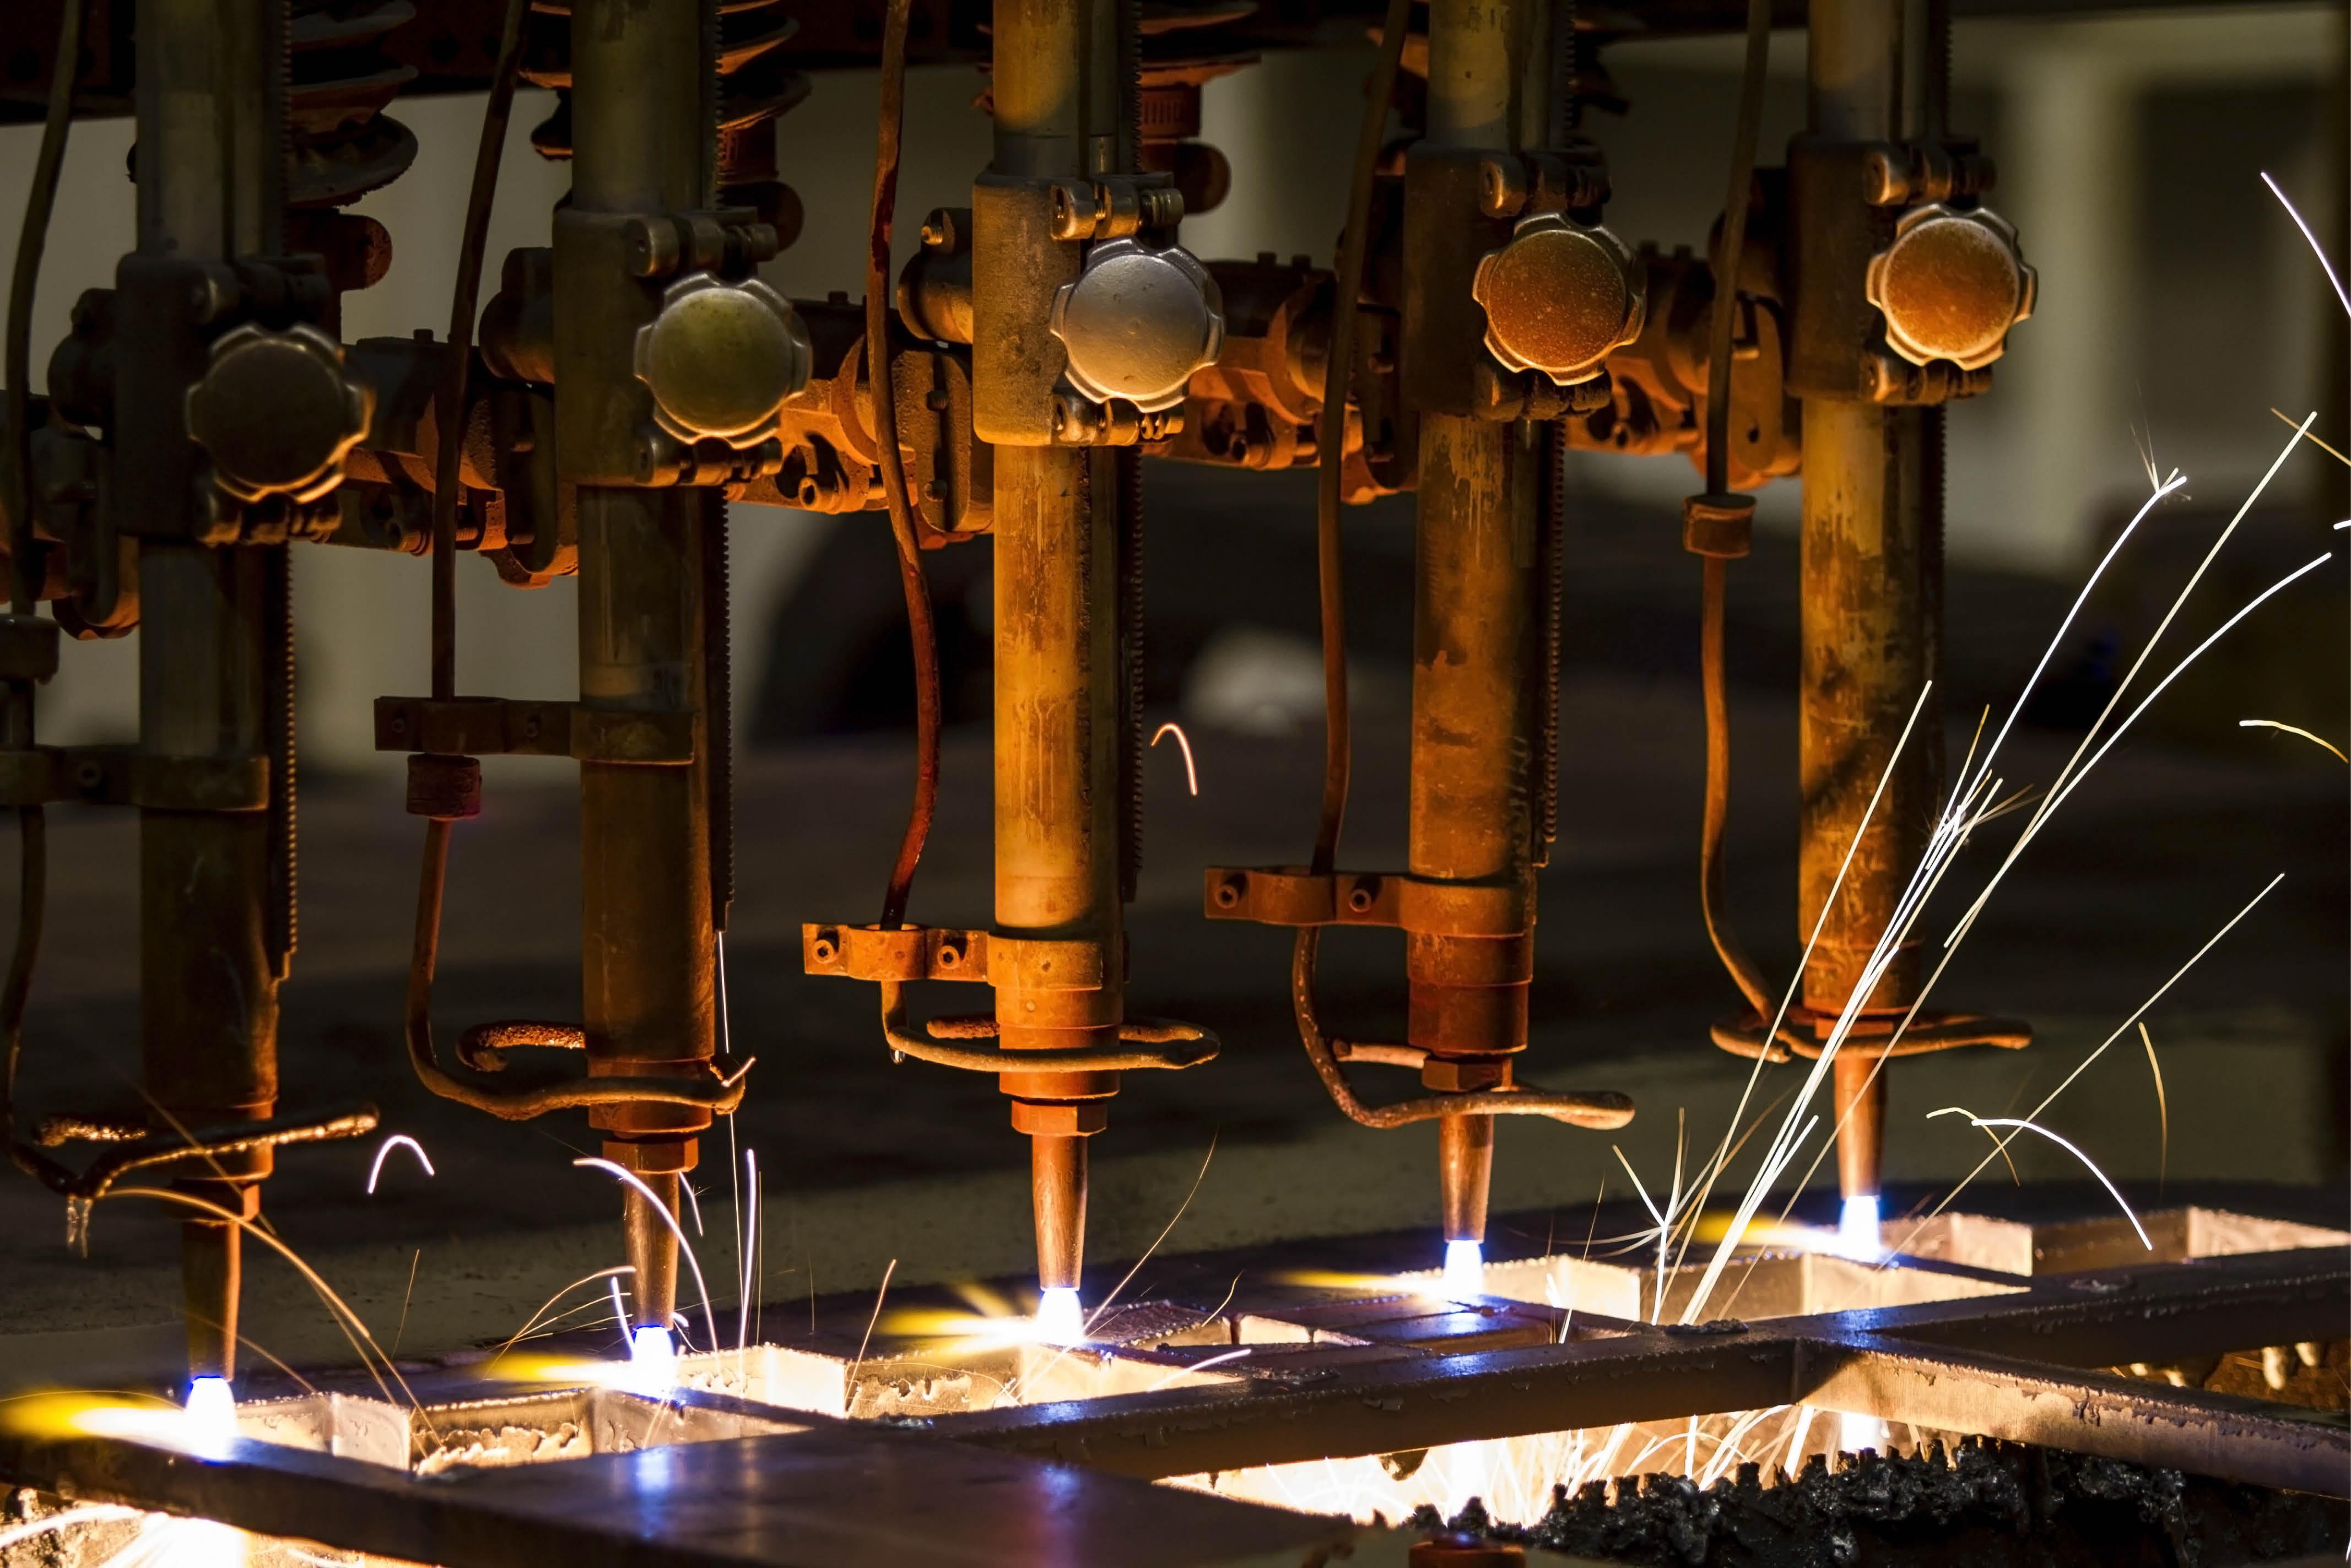 AdobeStock_69704212 manufacturing